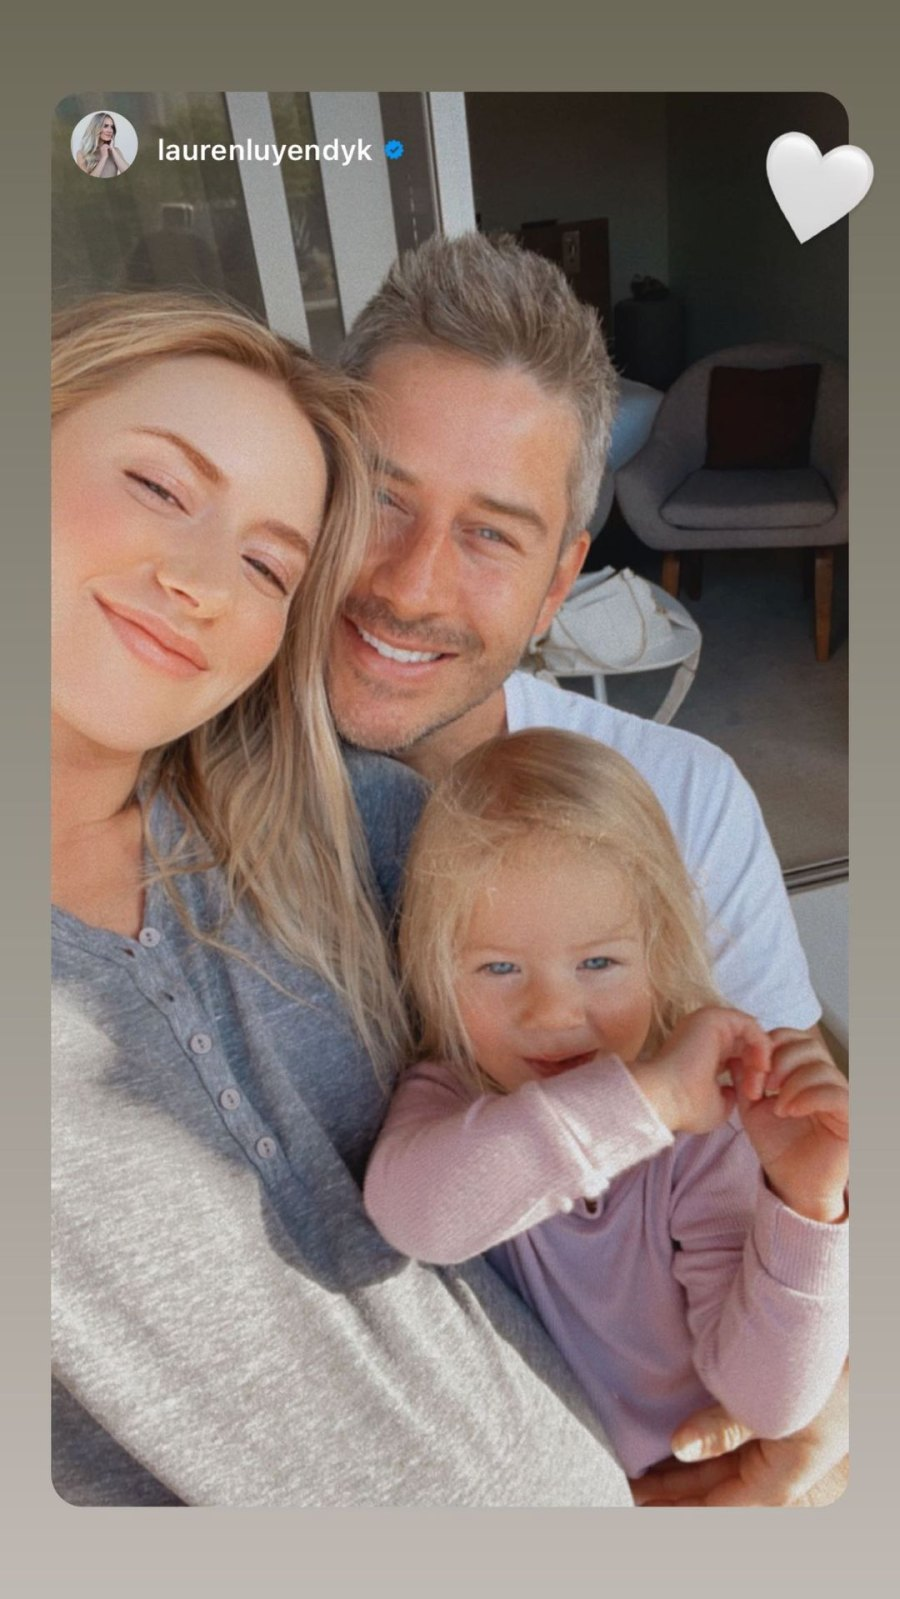 Family Photo! See Pregnant Lauren Burnham's Baby Bump Album